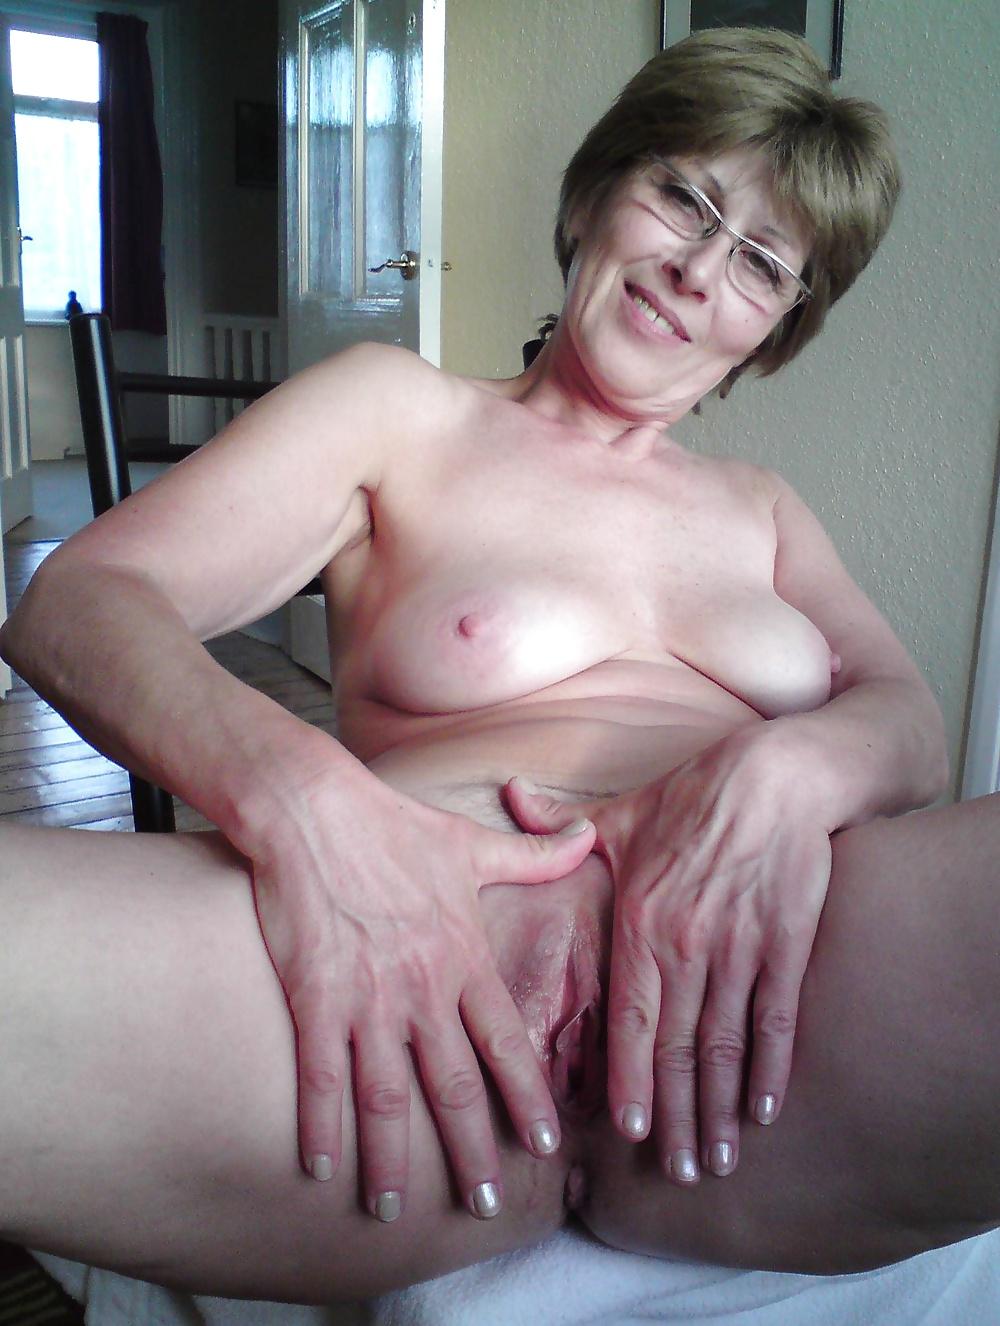 Granny glasses nude nelson nude